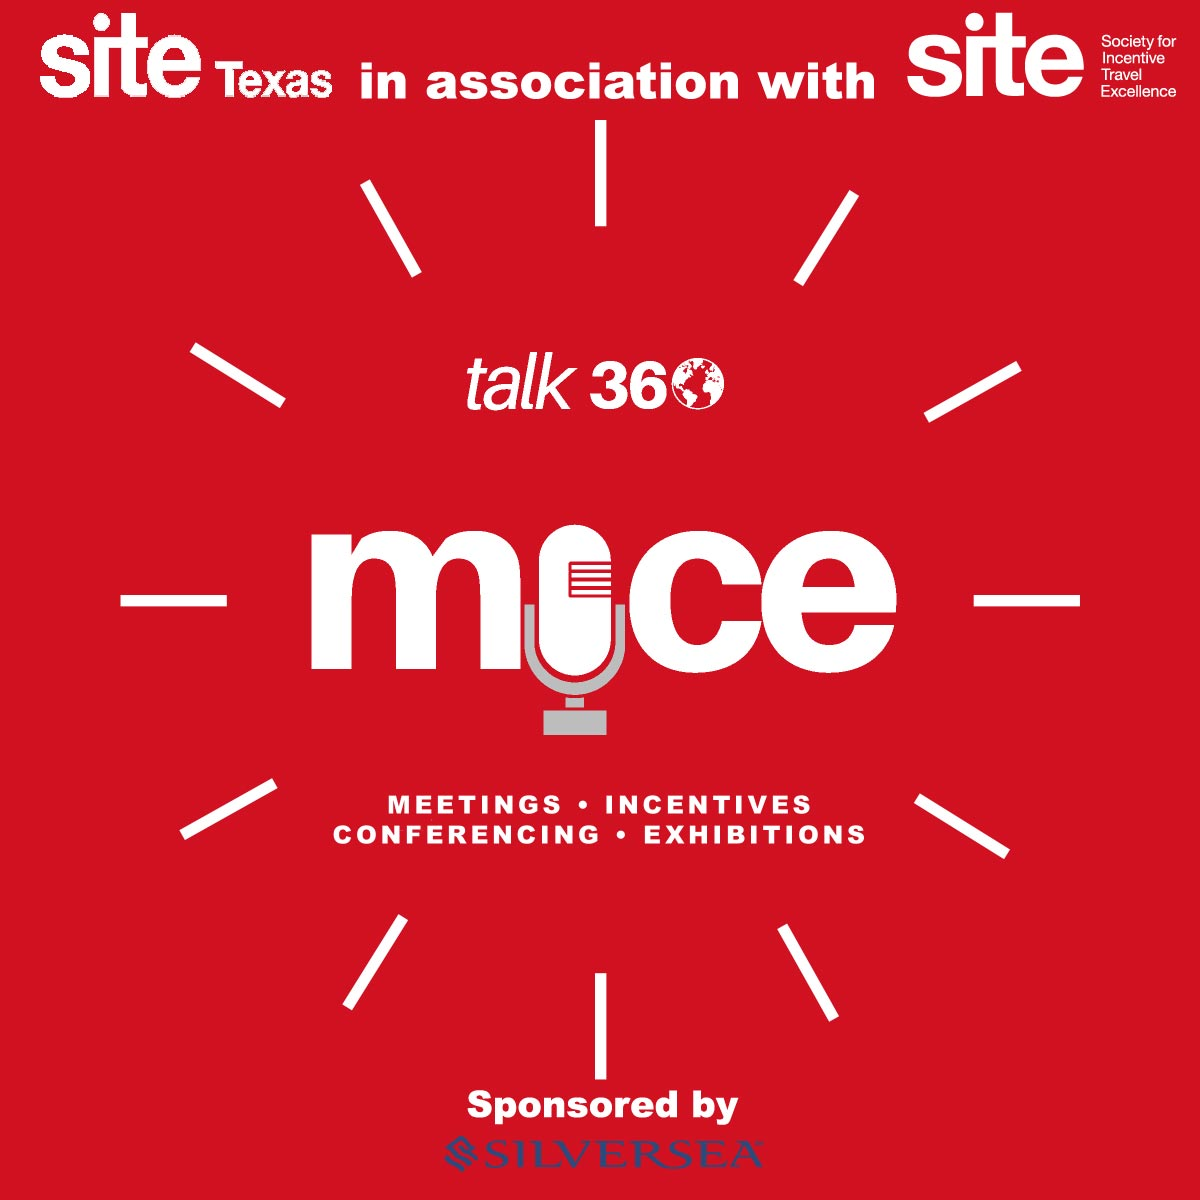 MICE Talk 360 / Take 5 with MICE Talk 360